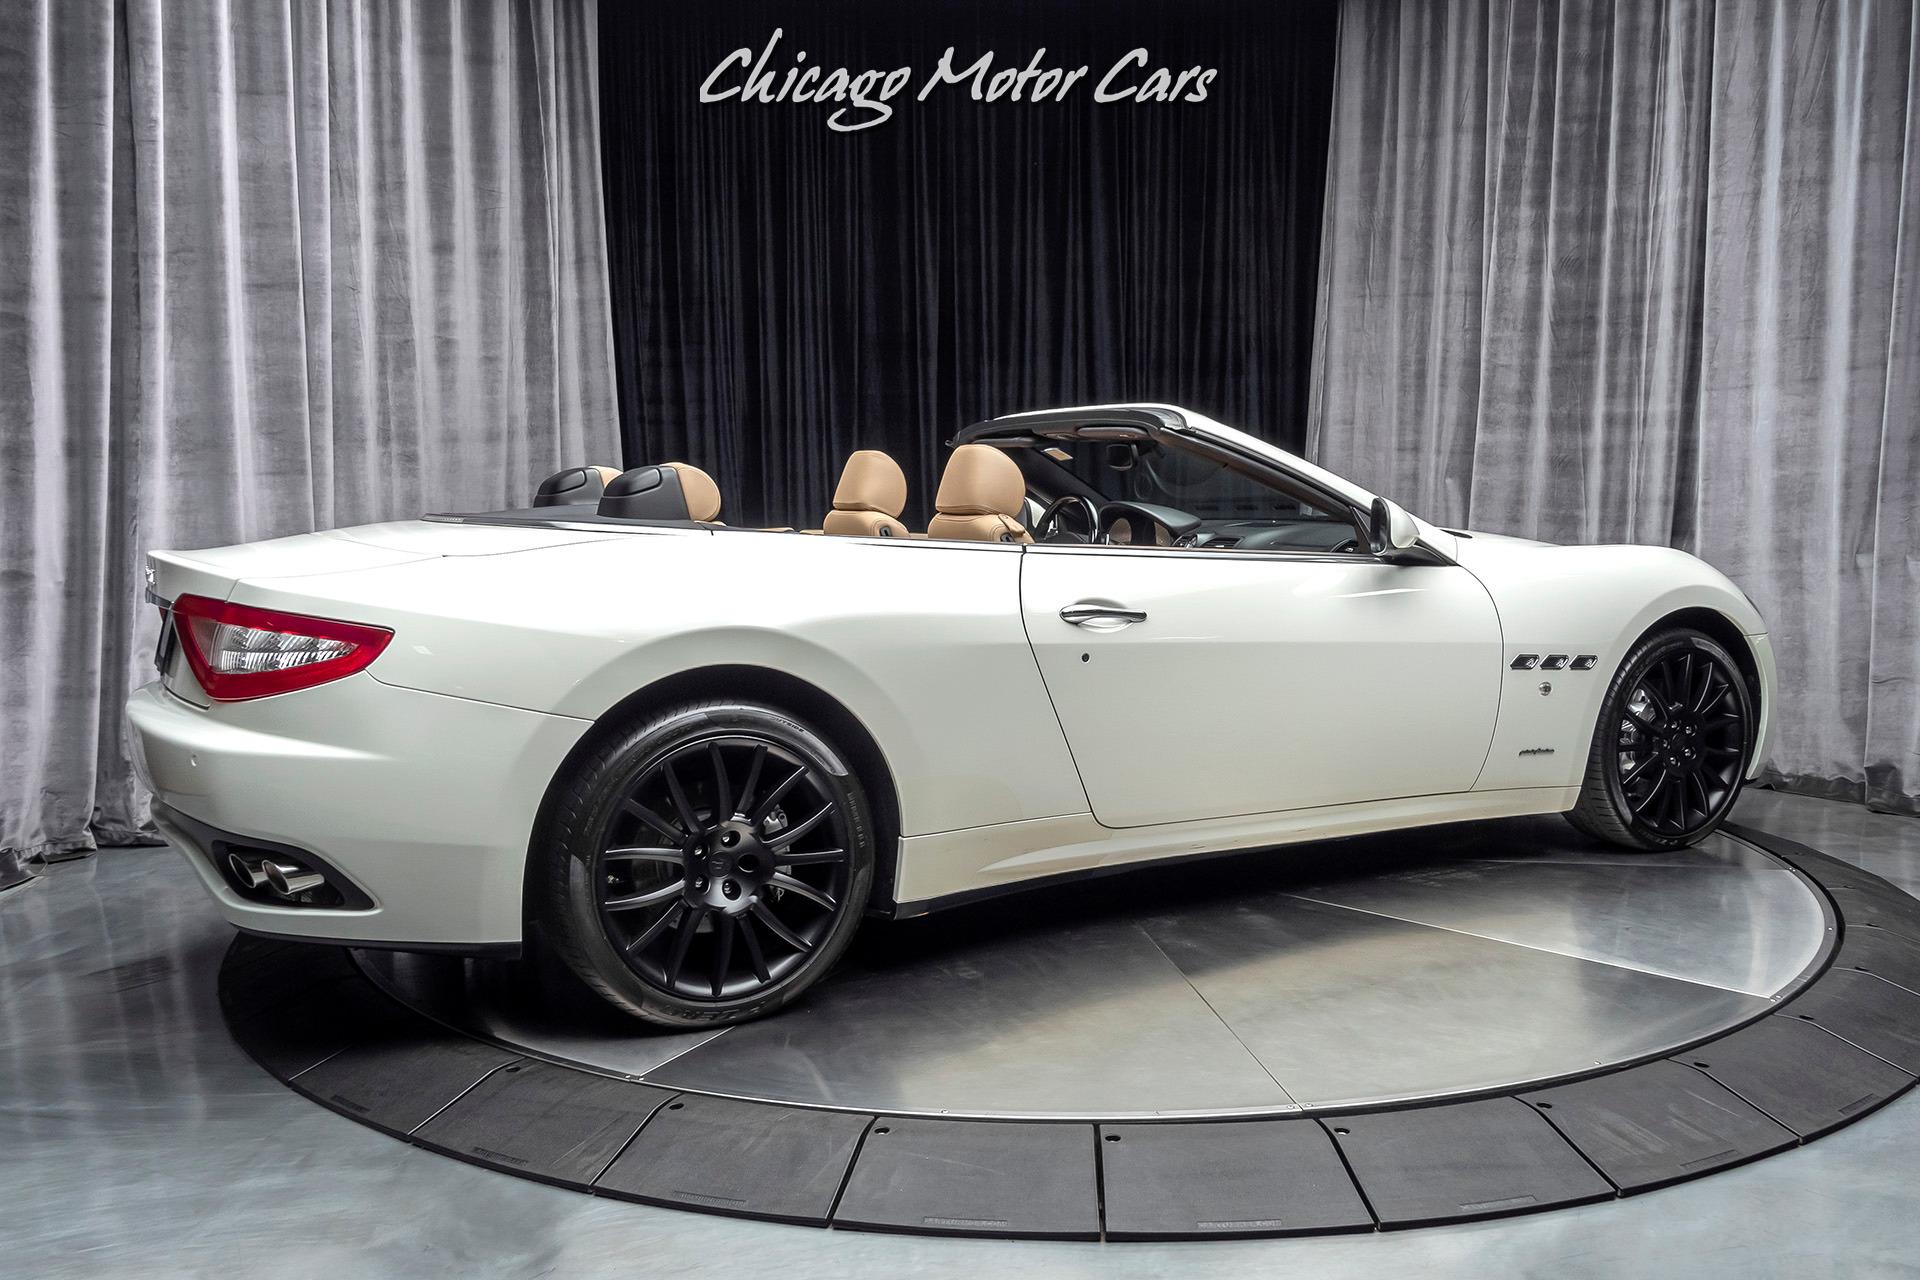 Used-2013-Maserati-GranTurismo-Convertible-16K-MILES-20-INCH-TRIDENT-WHEELS-GLOSS-BLACK-TRIM